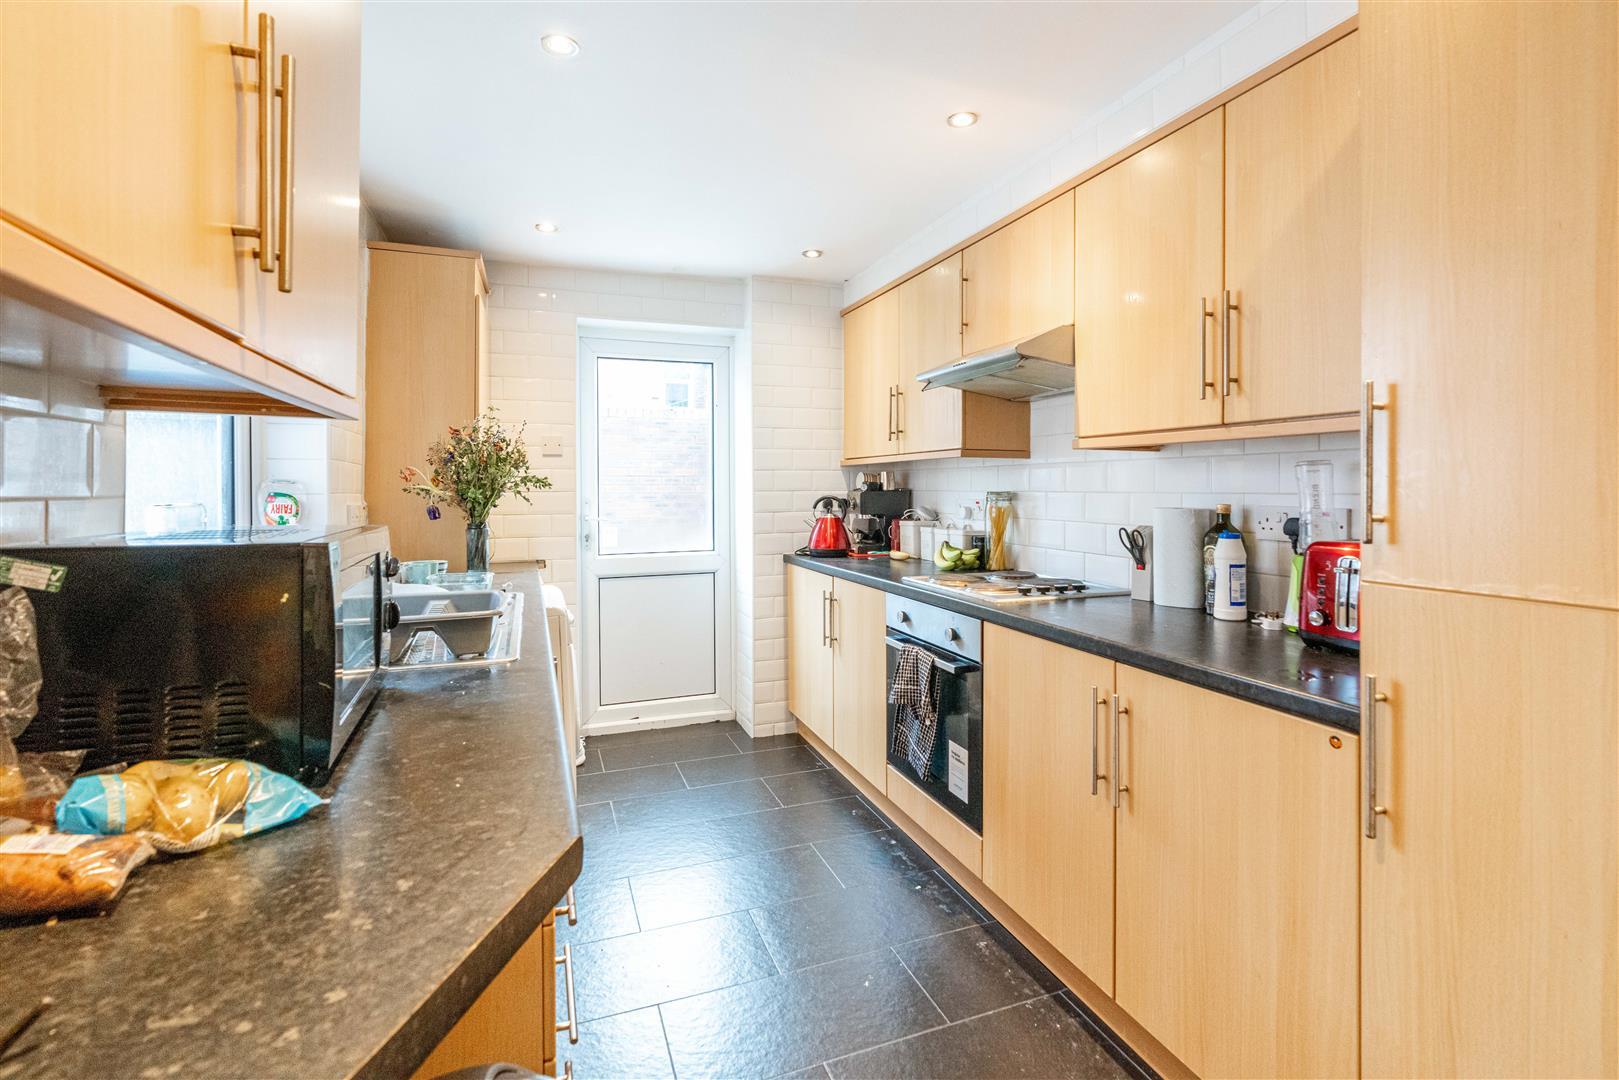 4 bed terraced house to rent in Heaton, NE6 5NX, NE6